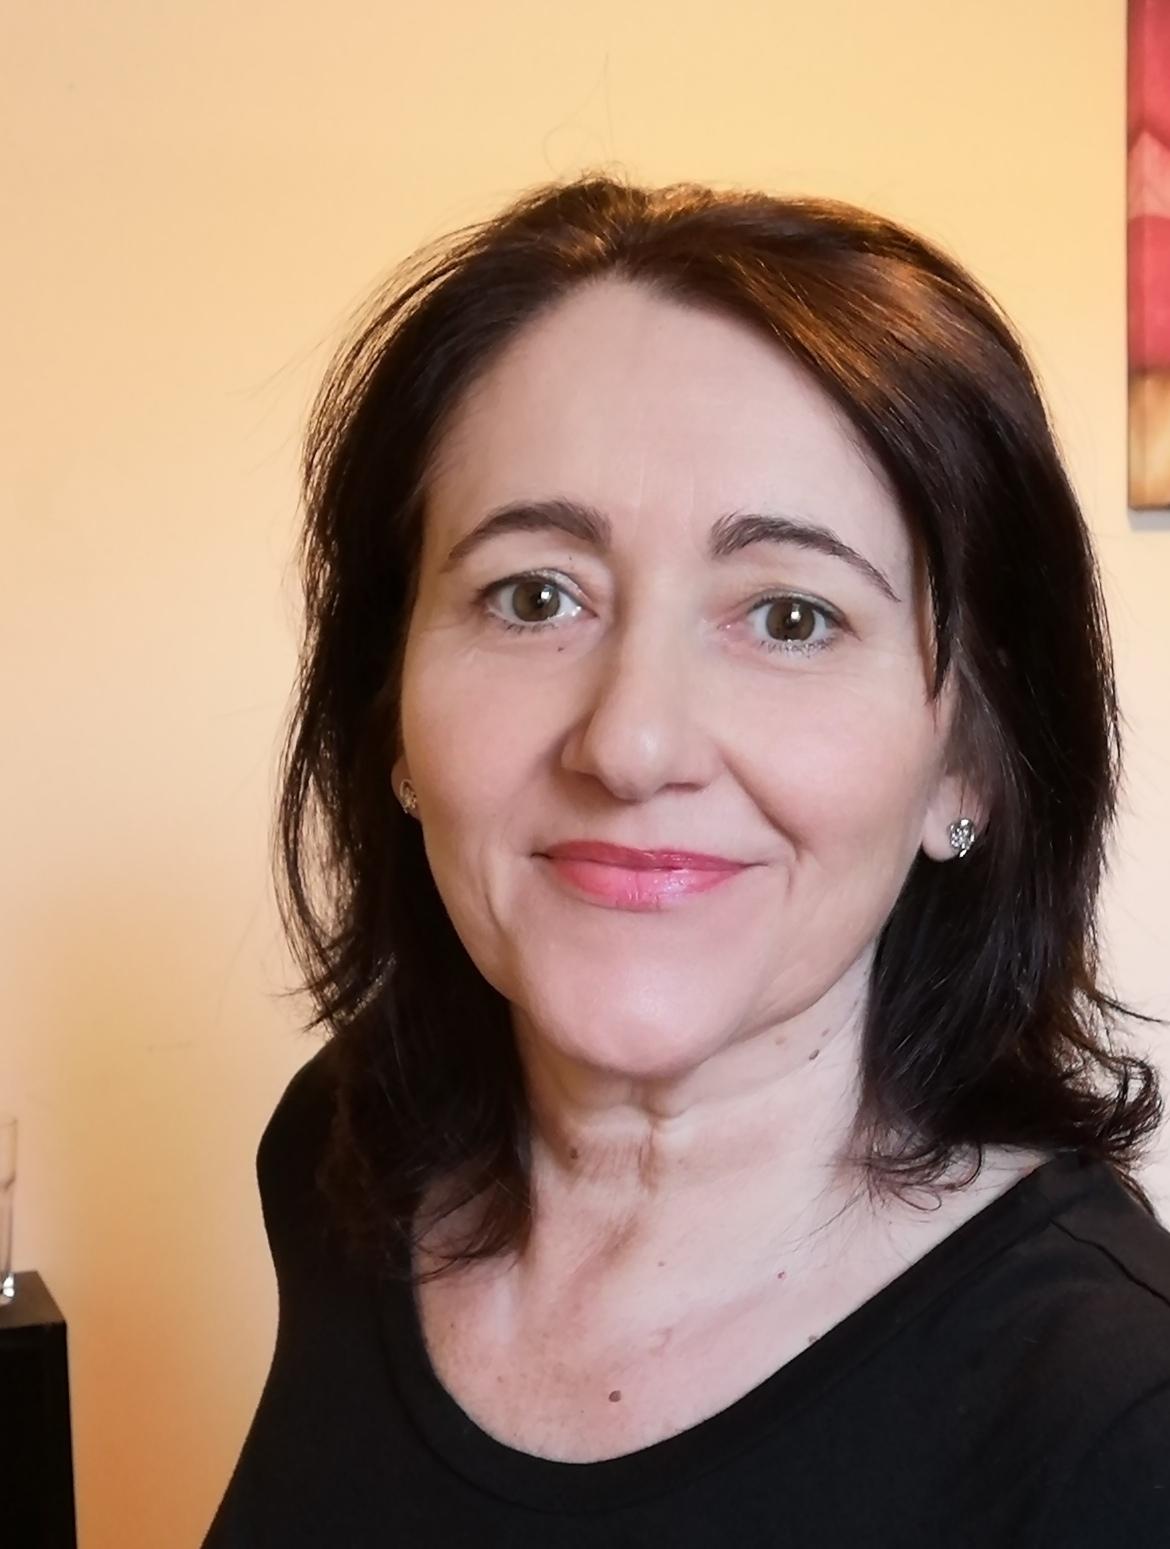 Fiona Catchpowle